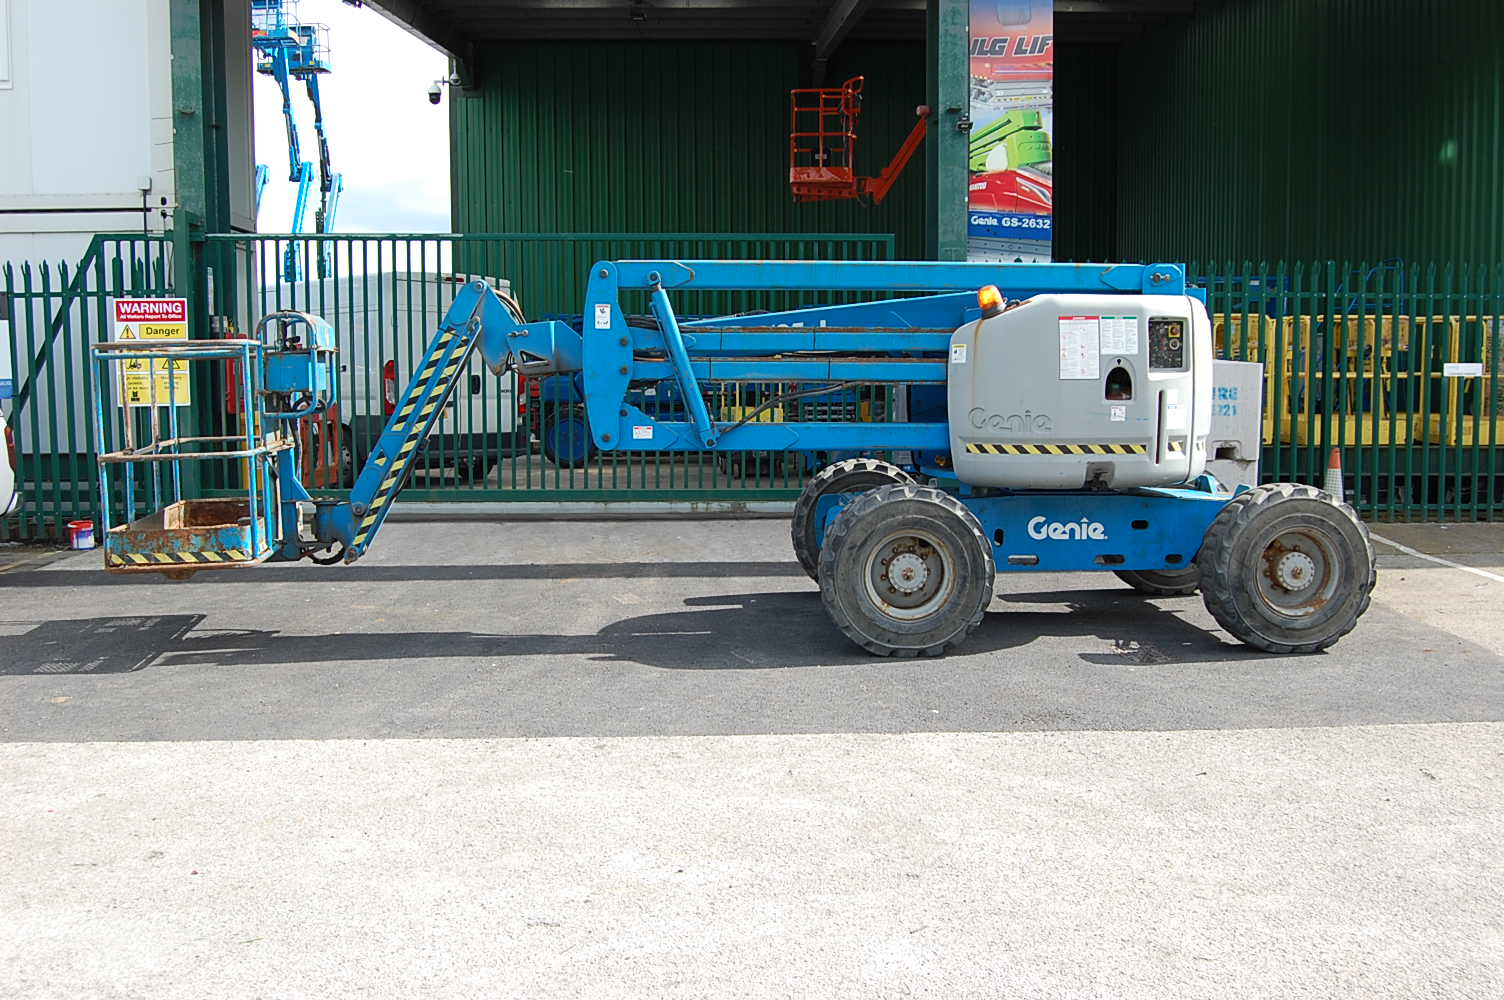 Genie Z45/25J Rough Terrain Diesel Boom Lift